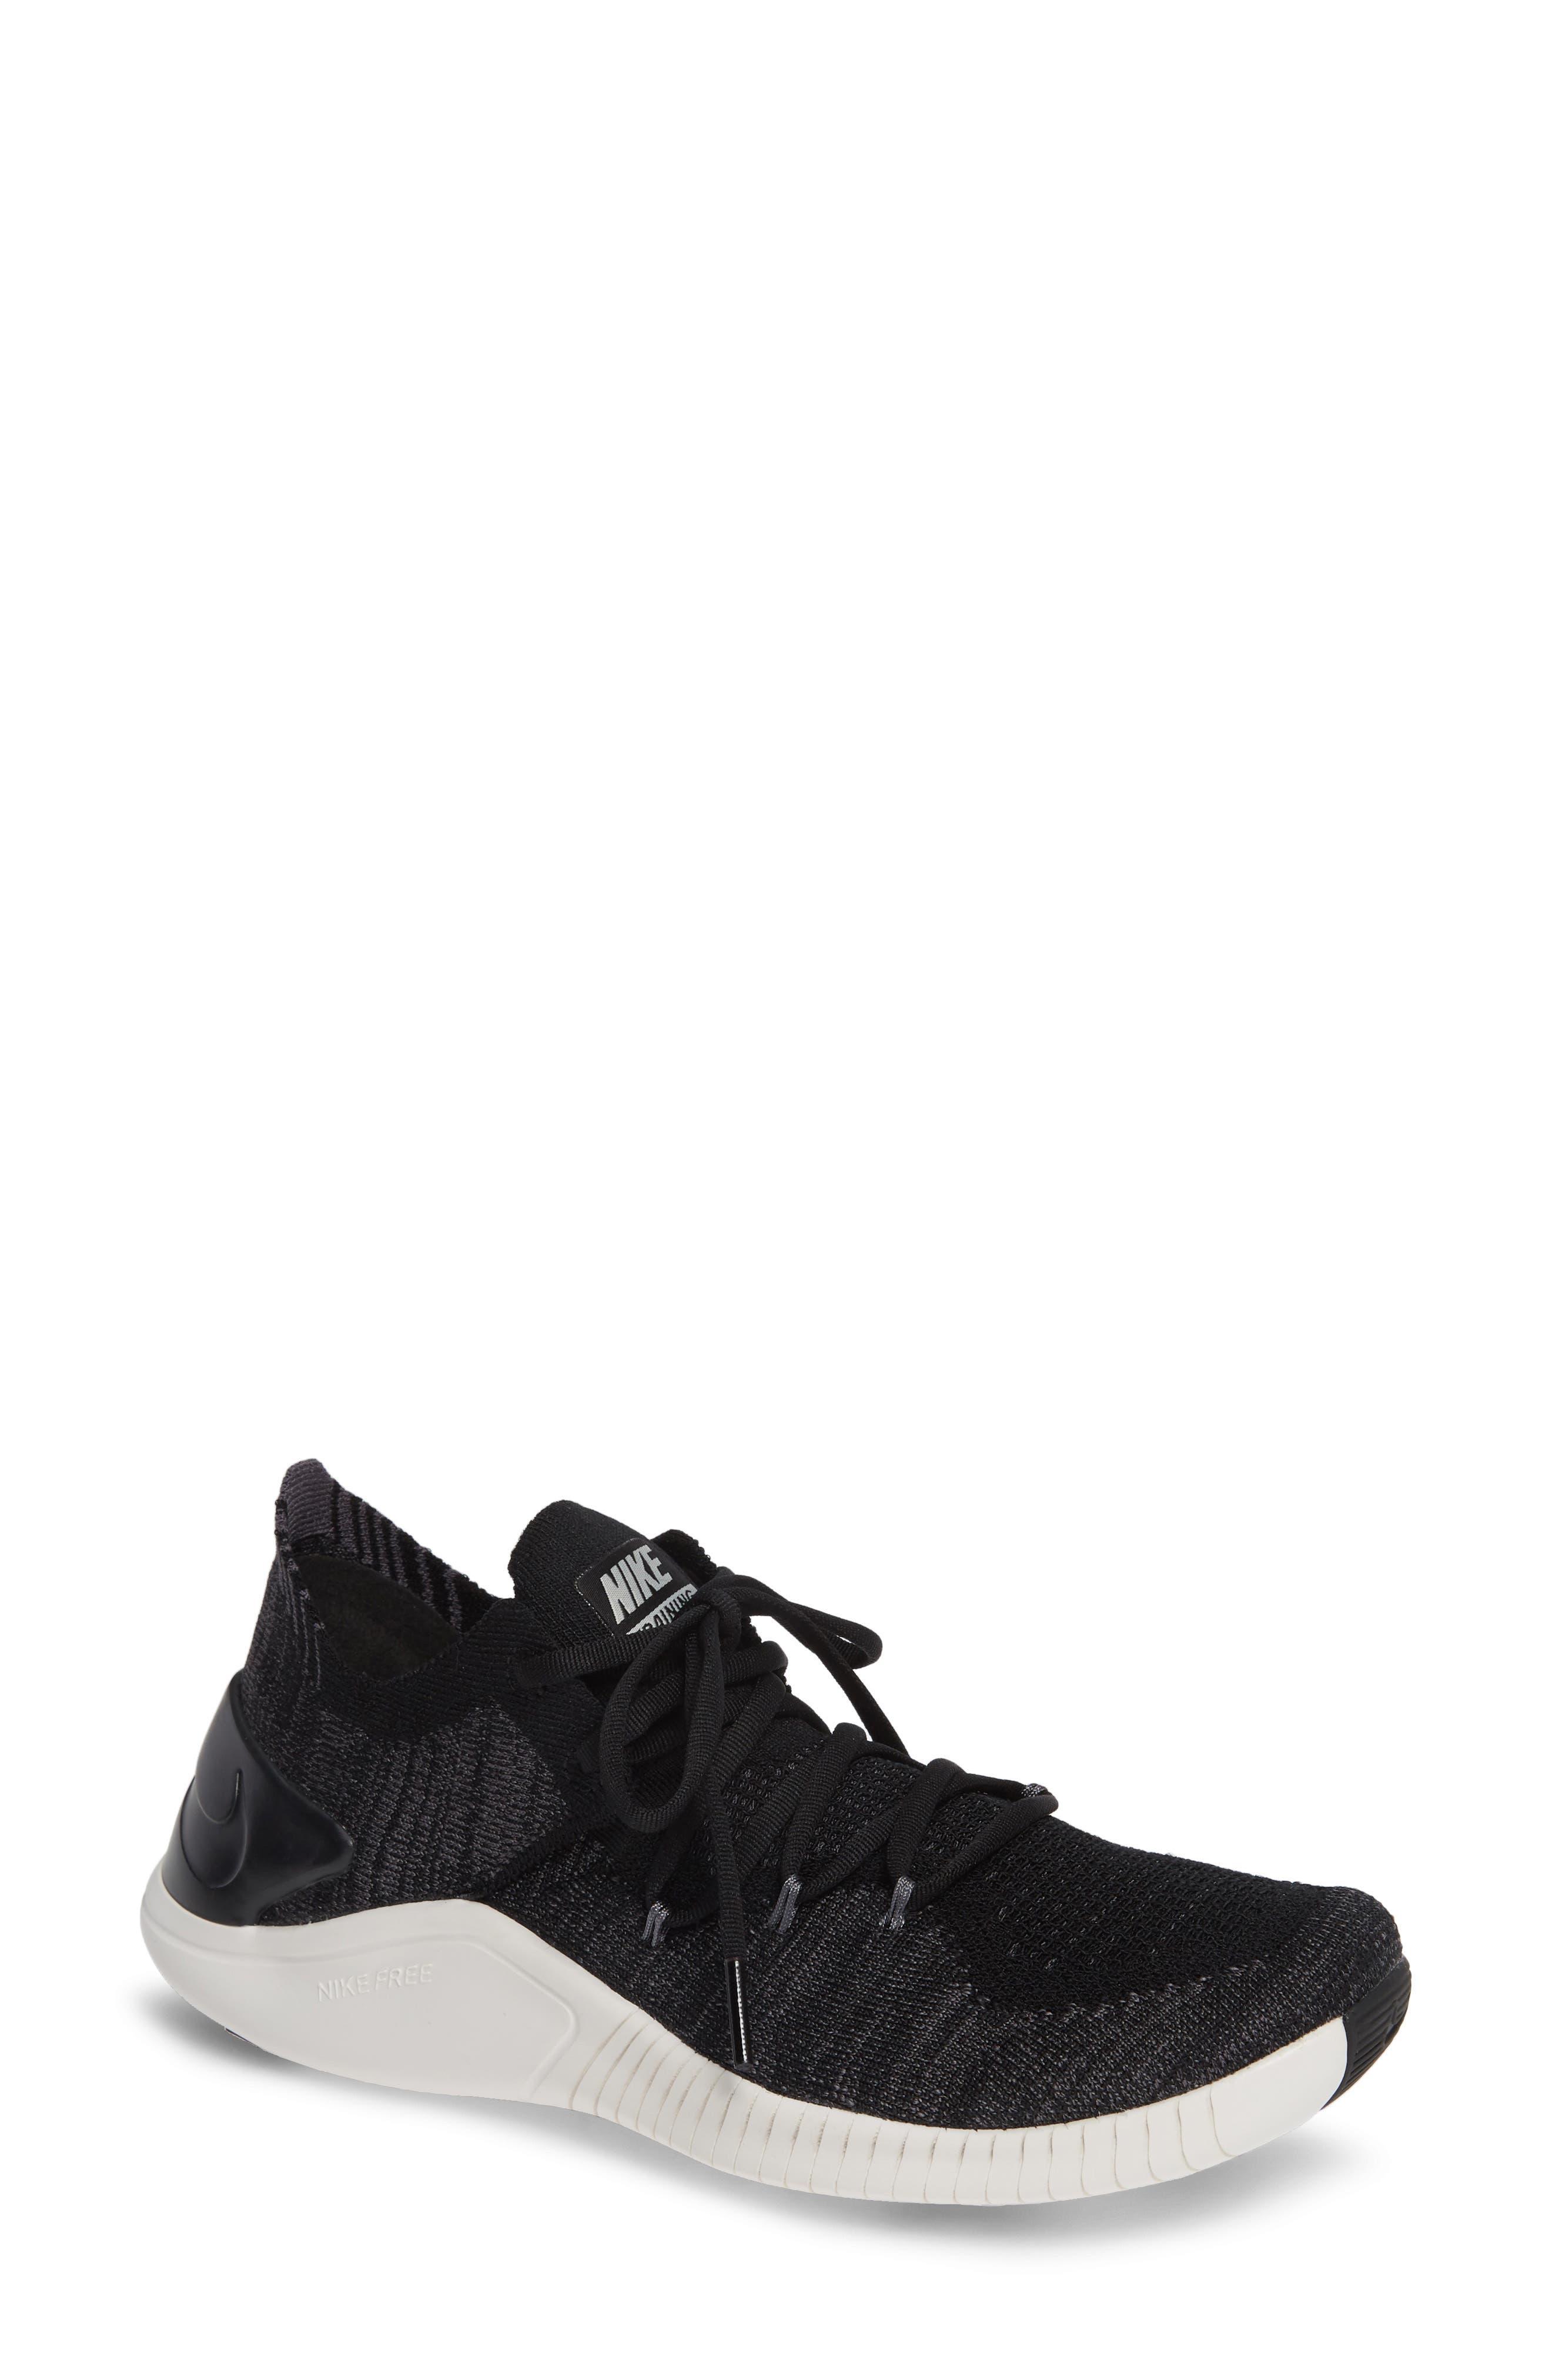 Free TR Flyknit 3 Training Shoe,                             Main thumbnail 1, color,                             BLACK/ DARK GREY-PHANTOM